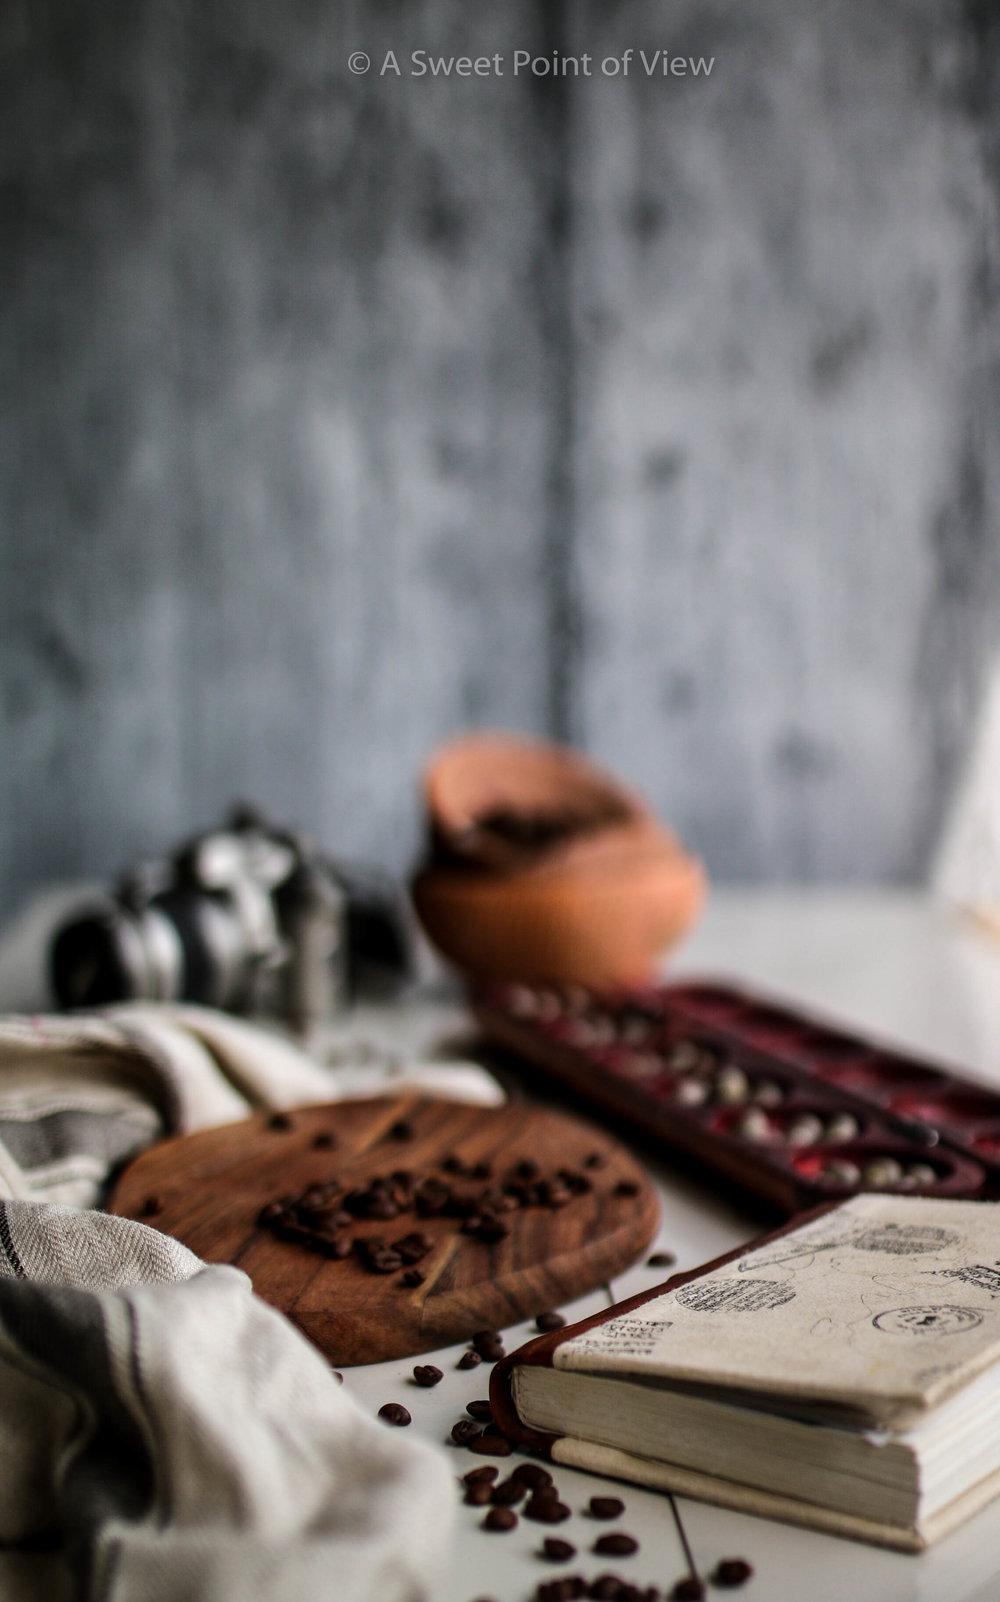 Ethopian-Coffee-Cake-1-of-1.jpg